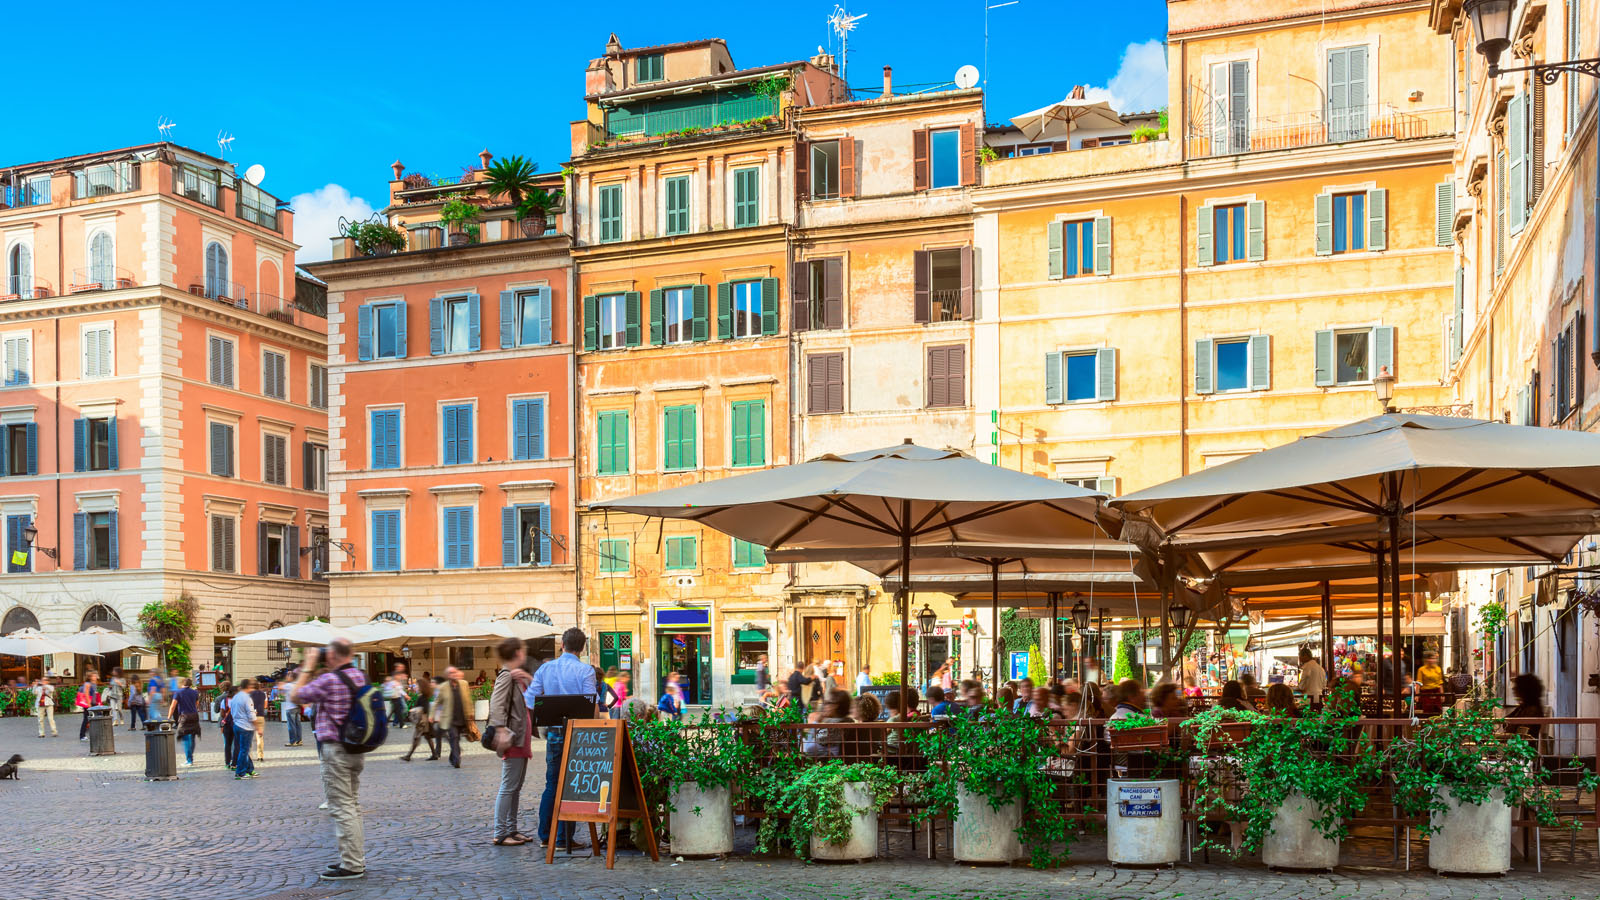 trastevere-rome-italy-square